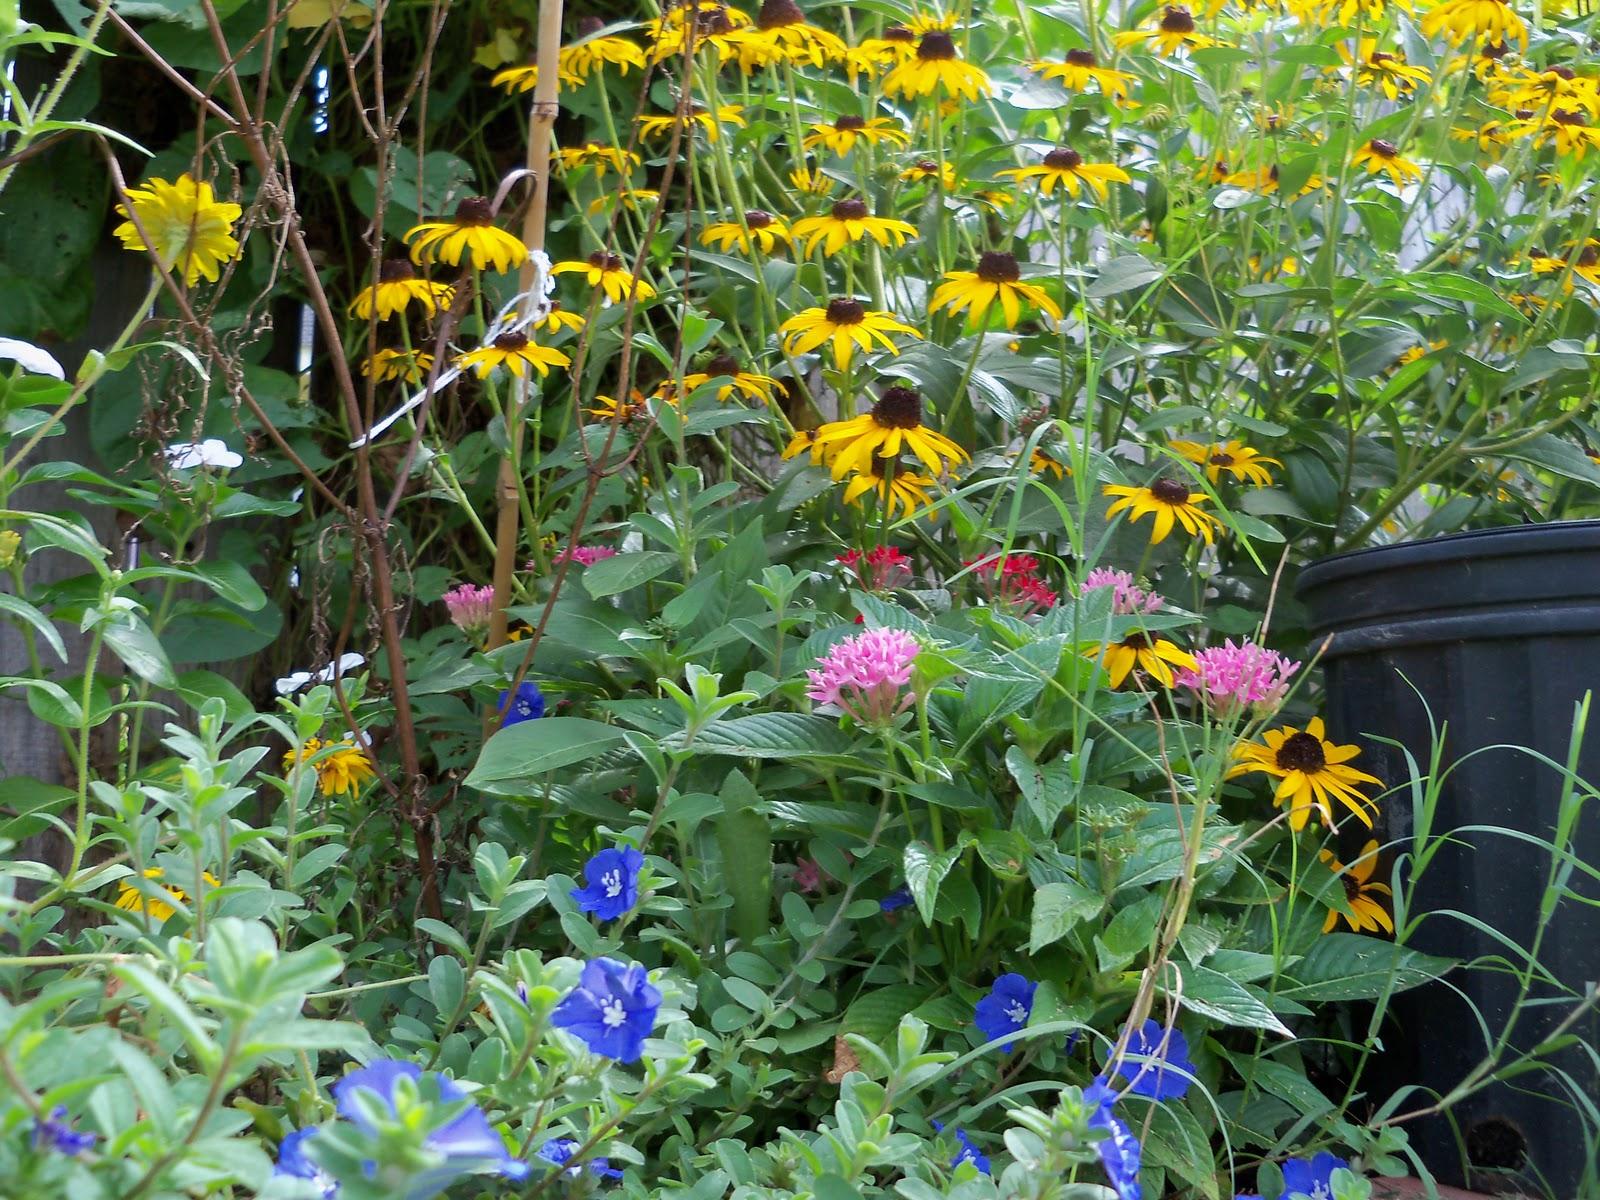 Gardening 2010, Part Three - 101_5205.JPG